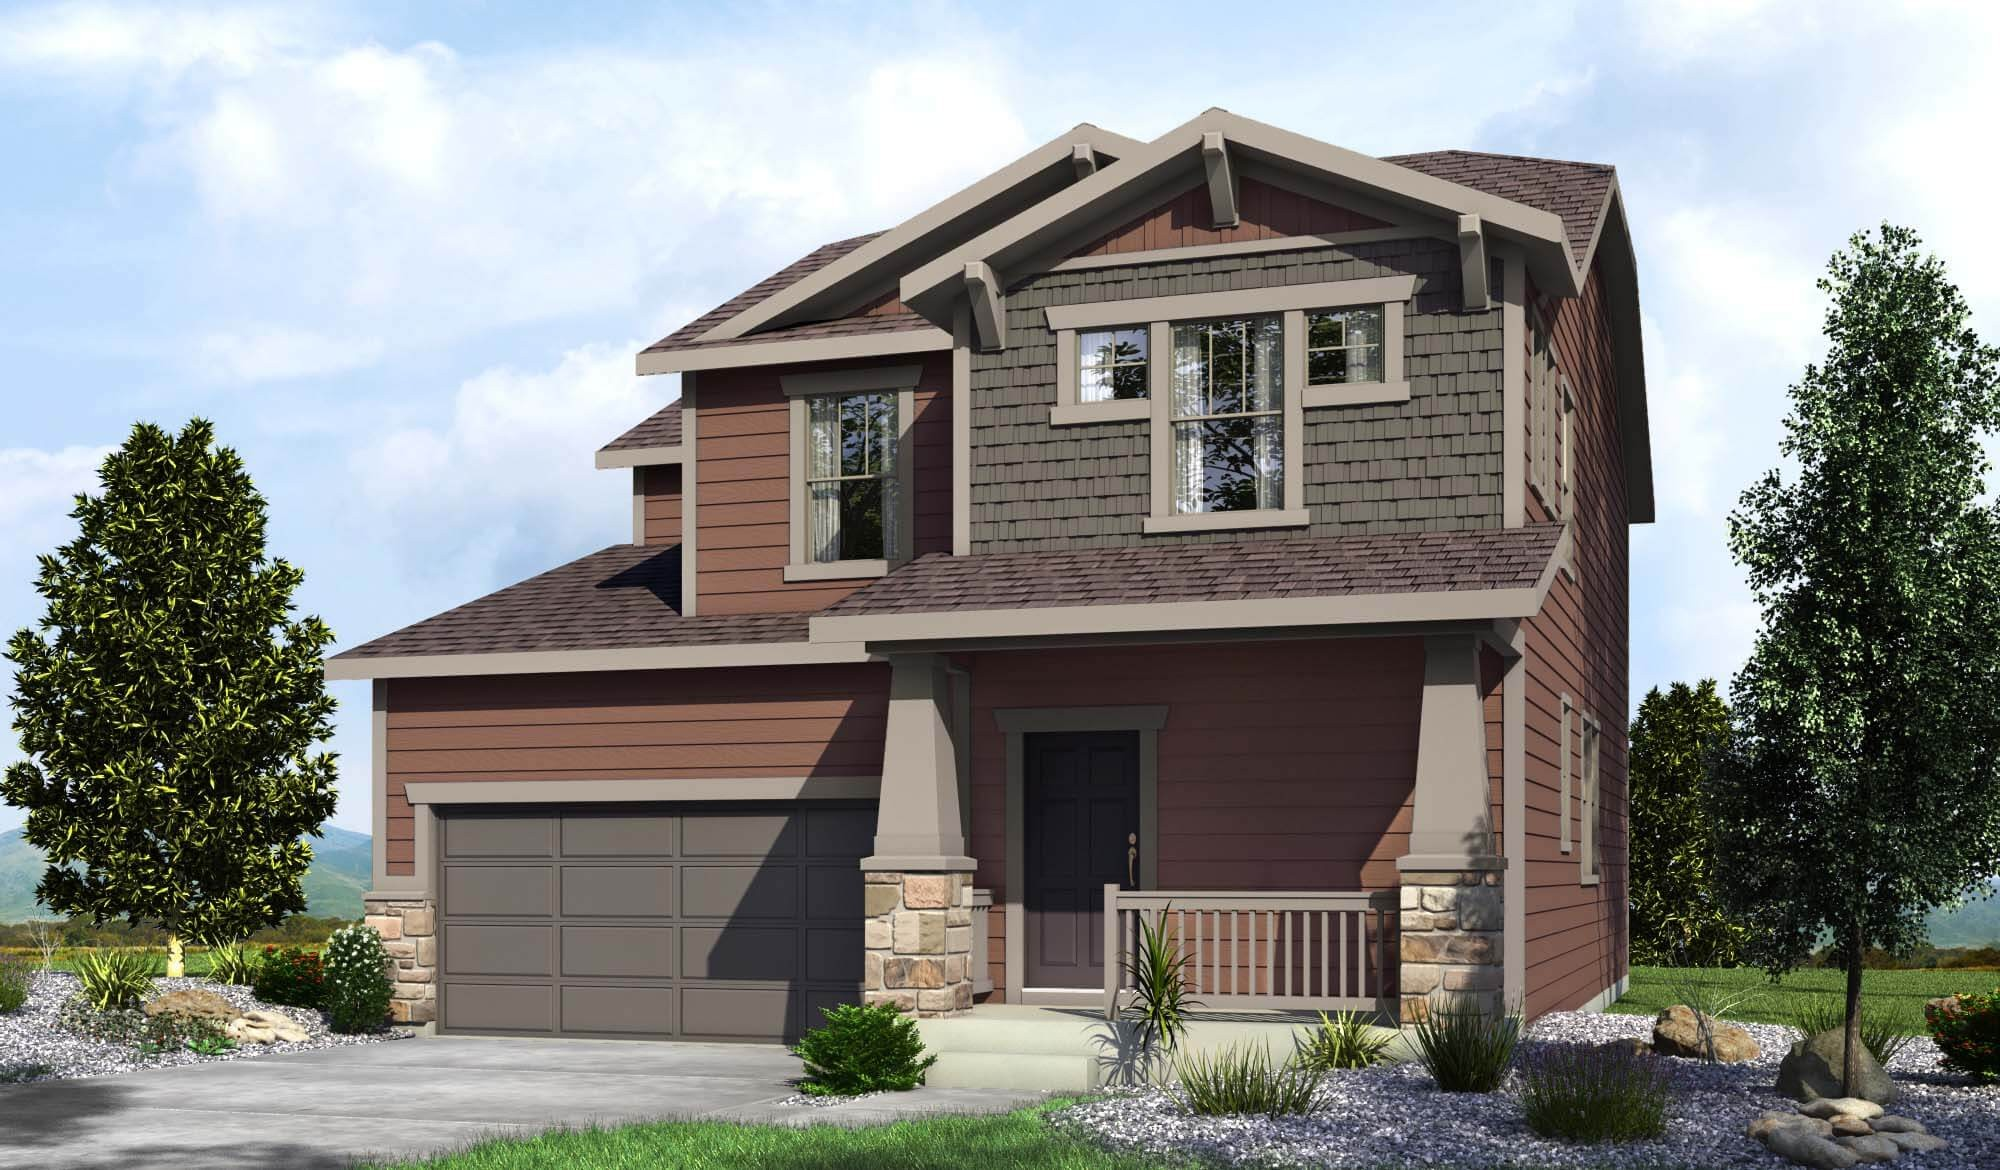 A52269_Village_Homes_Denver_Connection_35s_35C2_B_HERO20170509135656